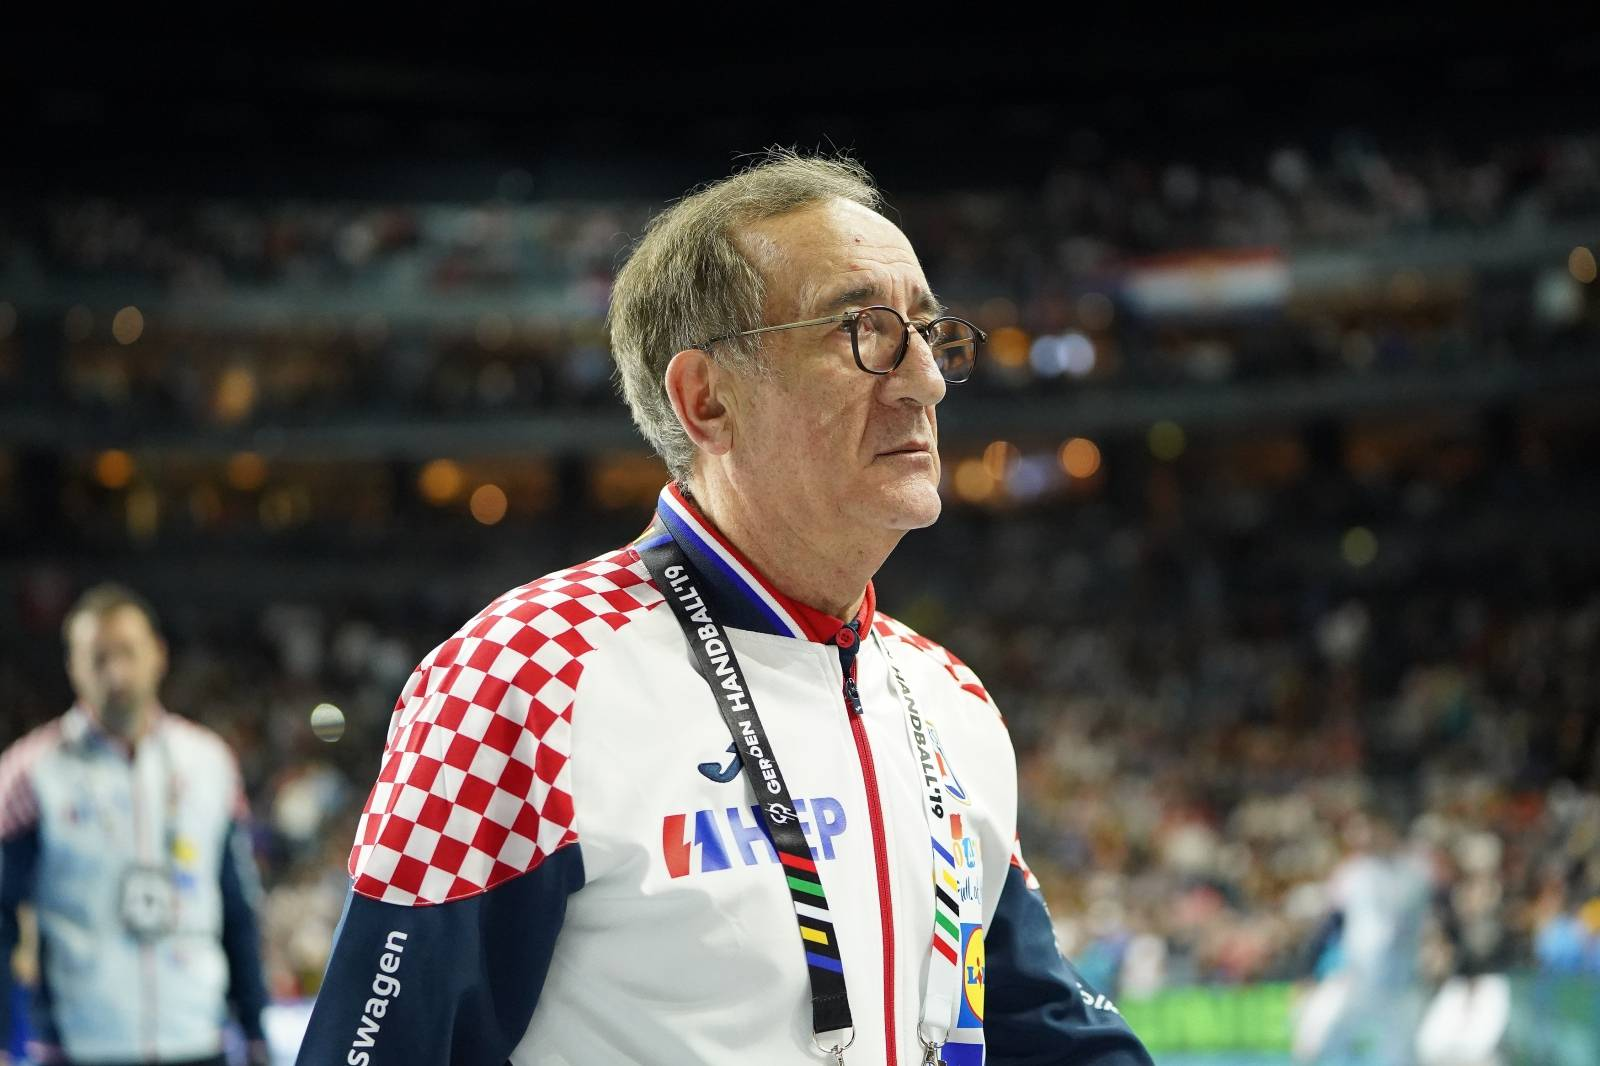 GER, IHF WM 2019, Frankreich (FRA) vs Kroatien (CRO)